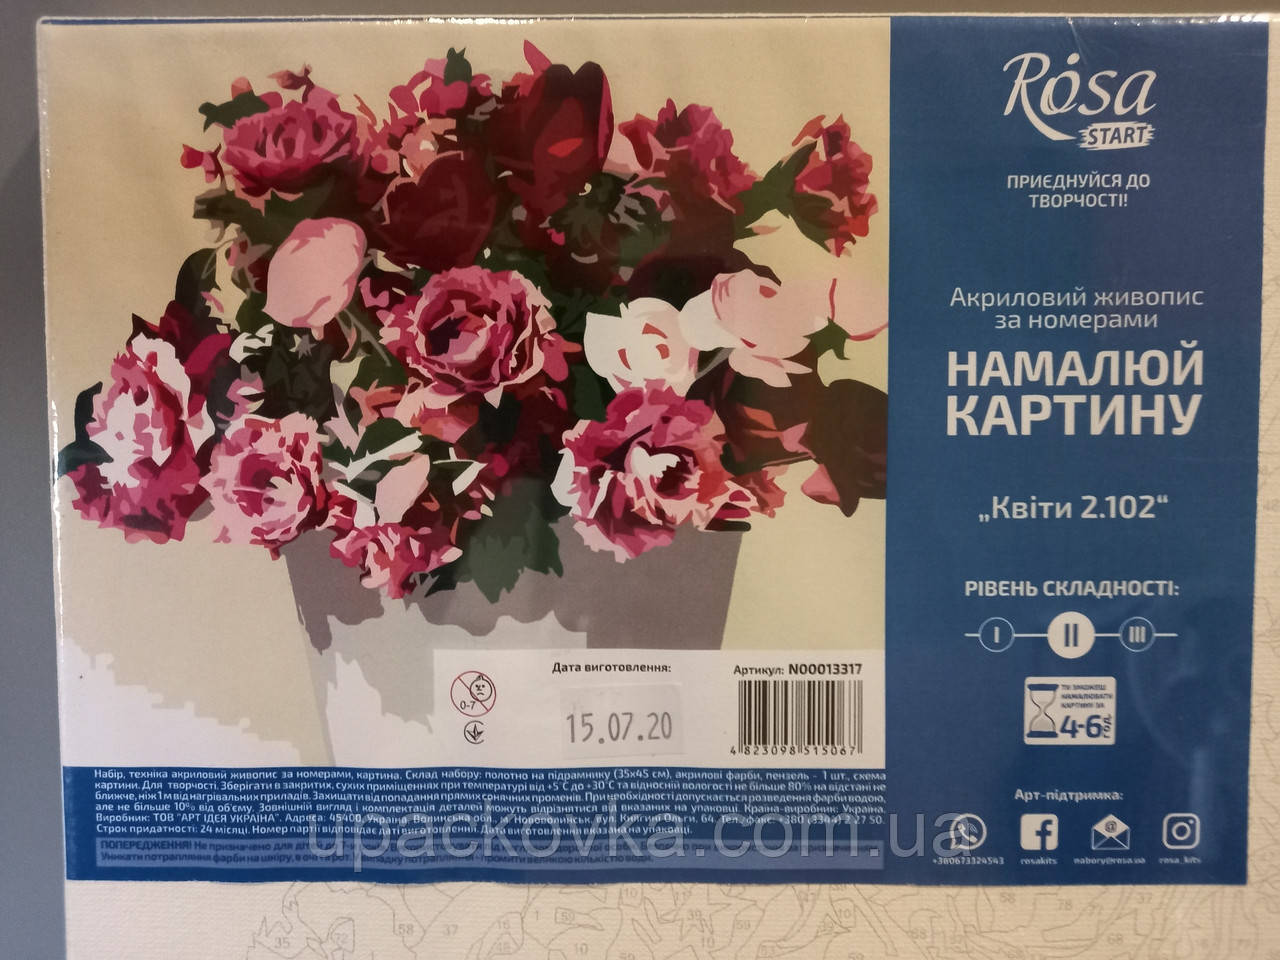 "Набор-стандарт, картина по номерам, ""Цветы 2.102, 35х45см, ROSA START"